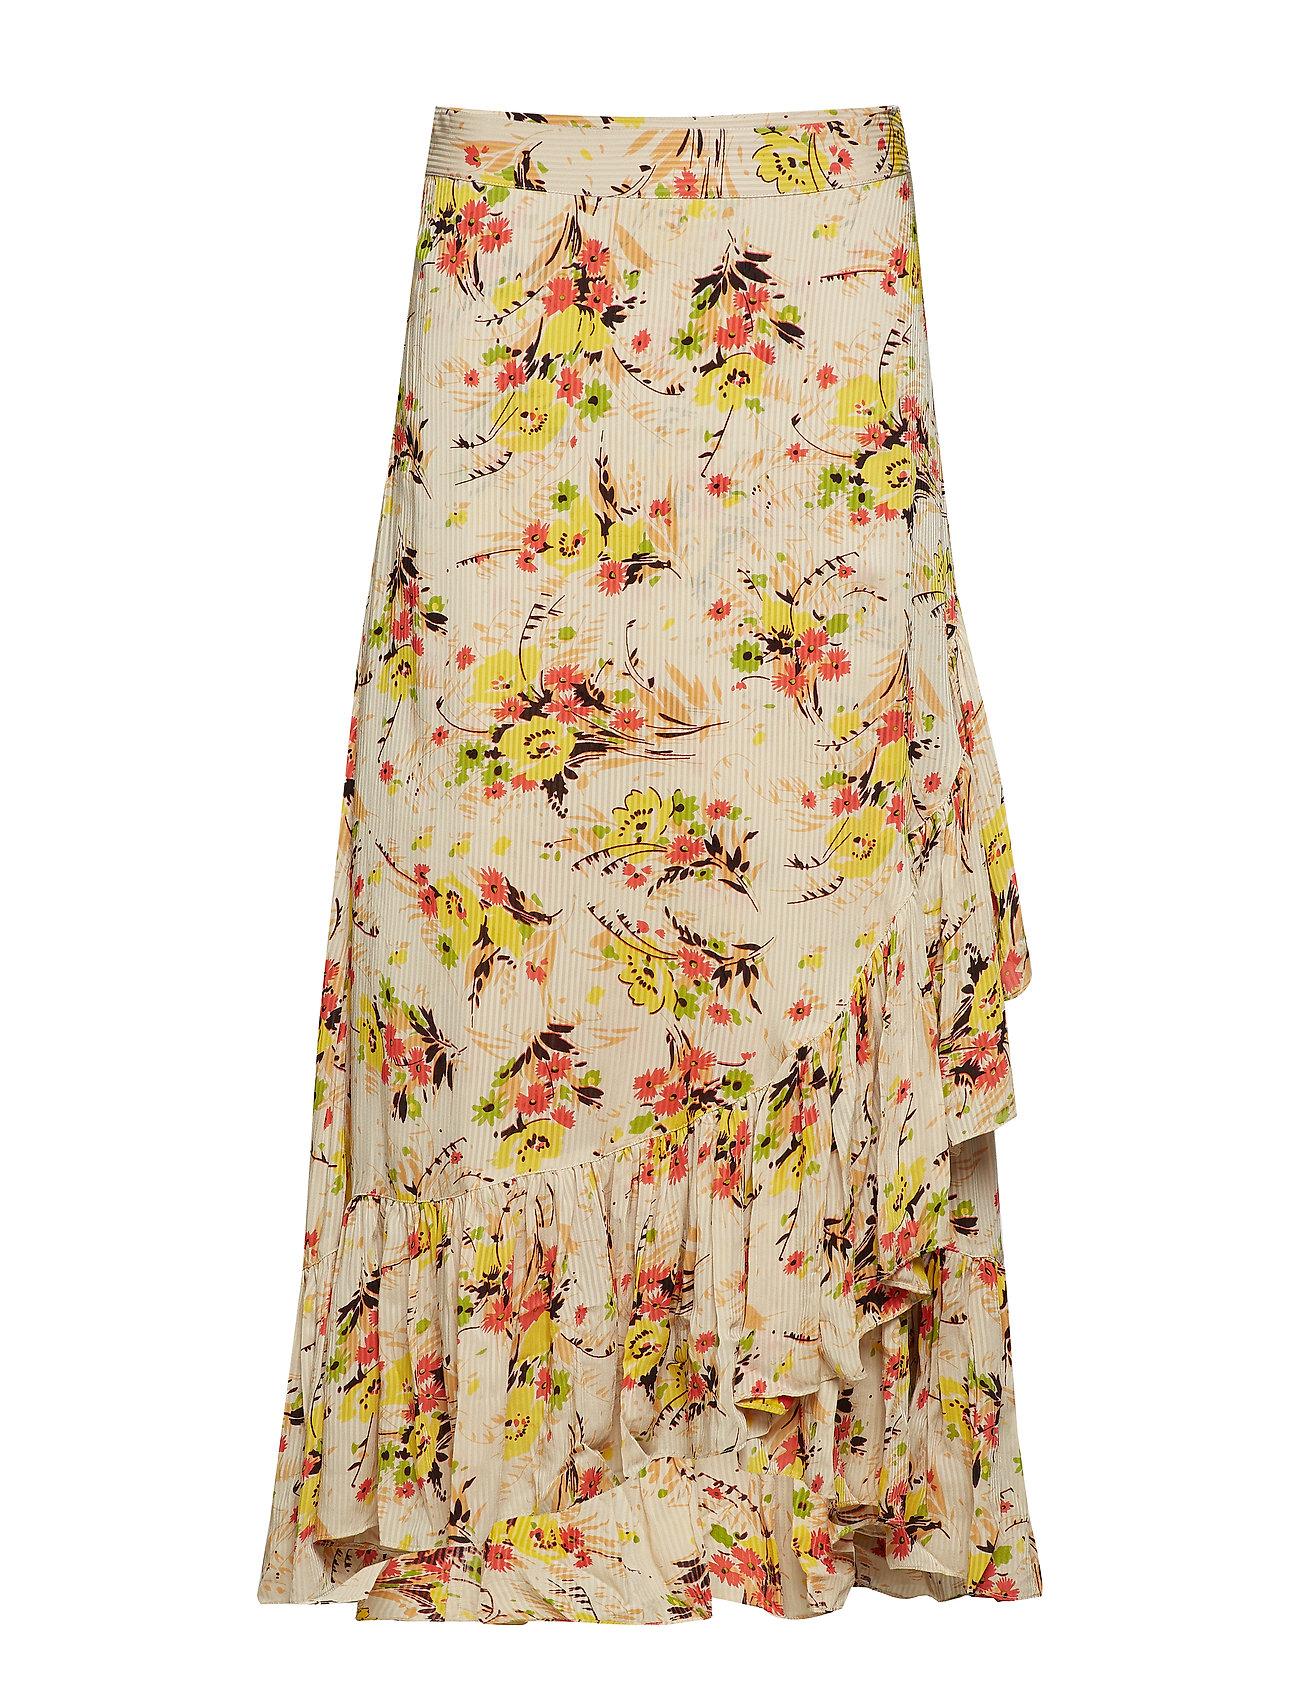 by Ti Mo Thin Semi Skirt - 781 CRISP SPRING